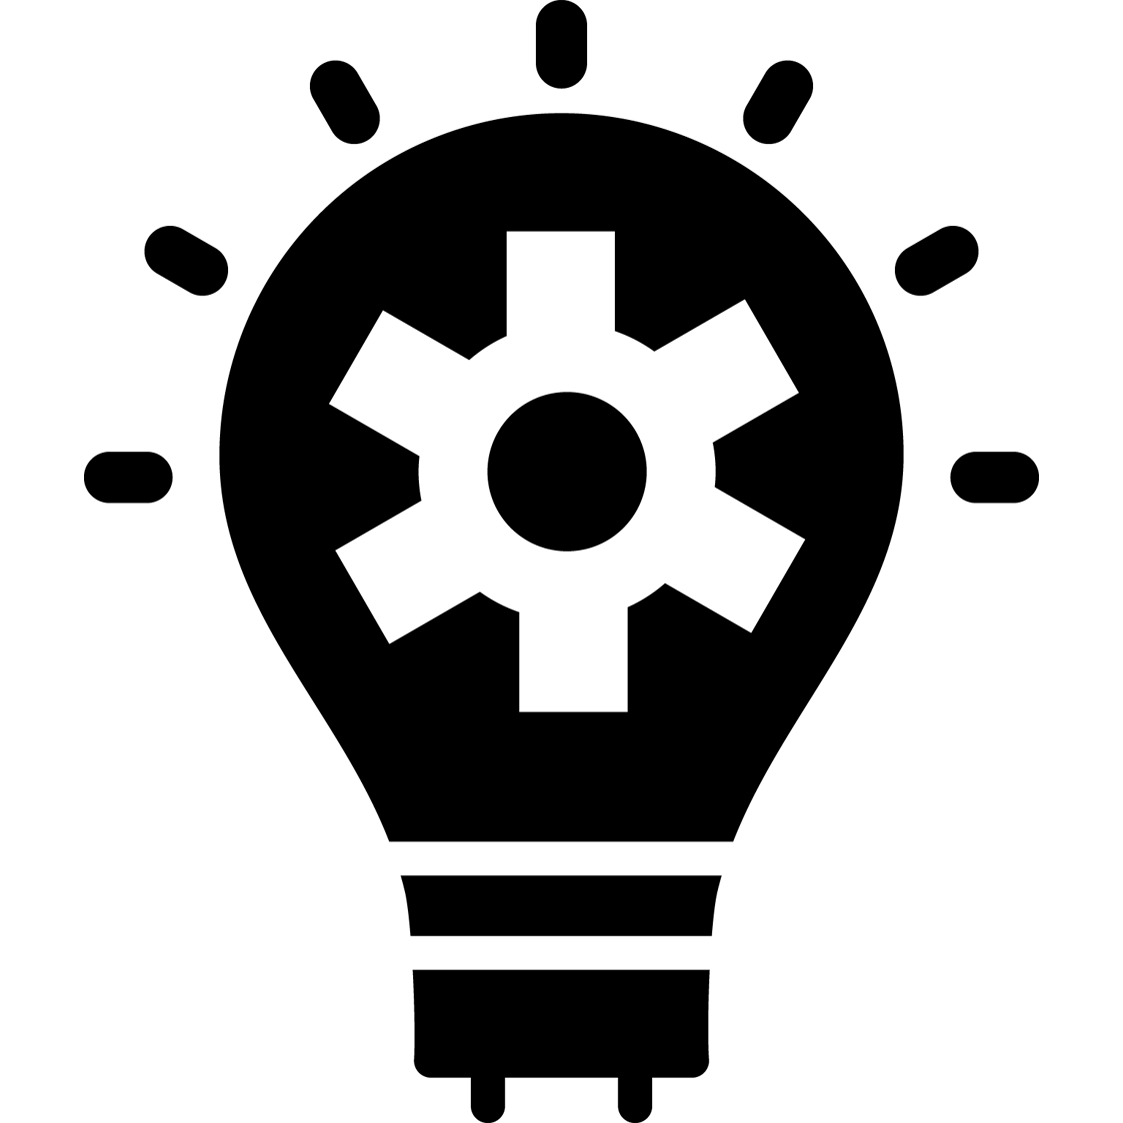 LIGHTBULB-CROP-black.png